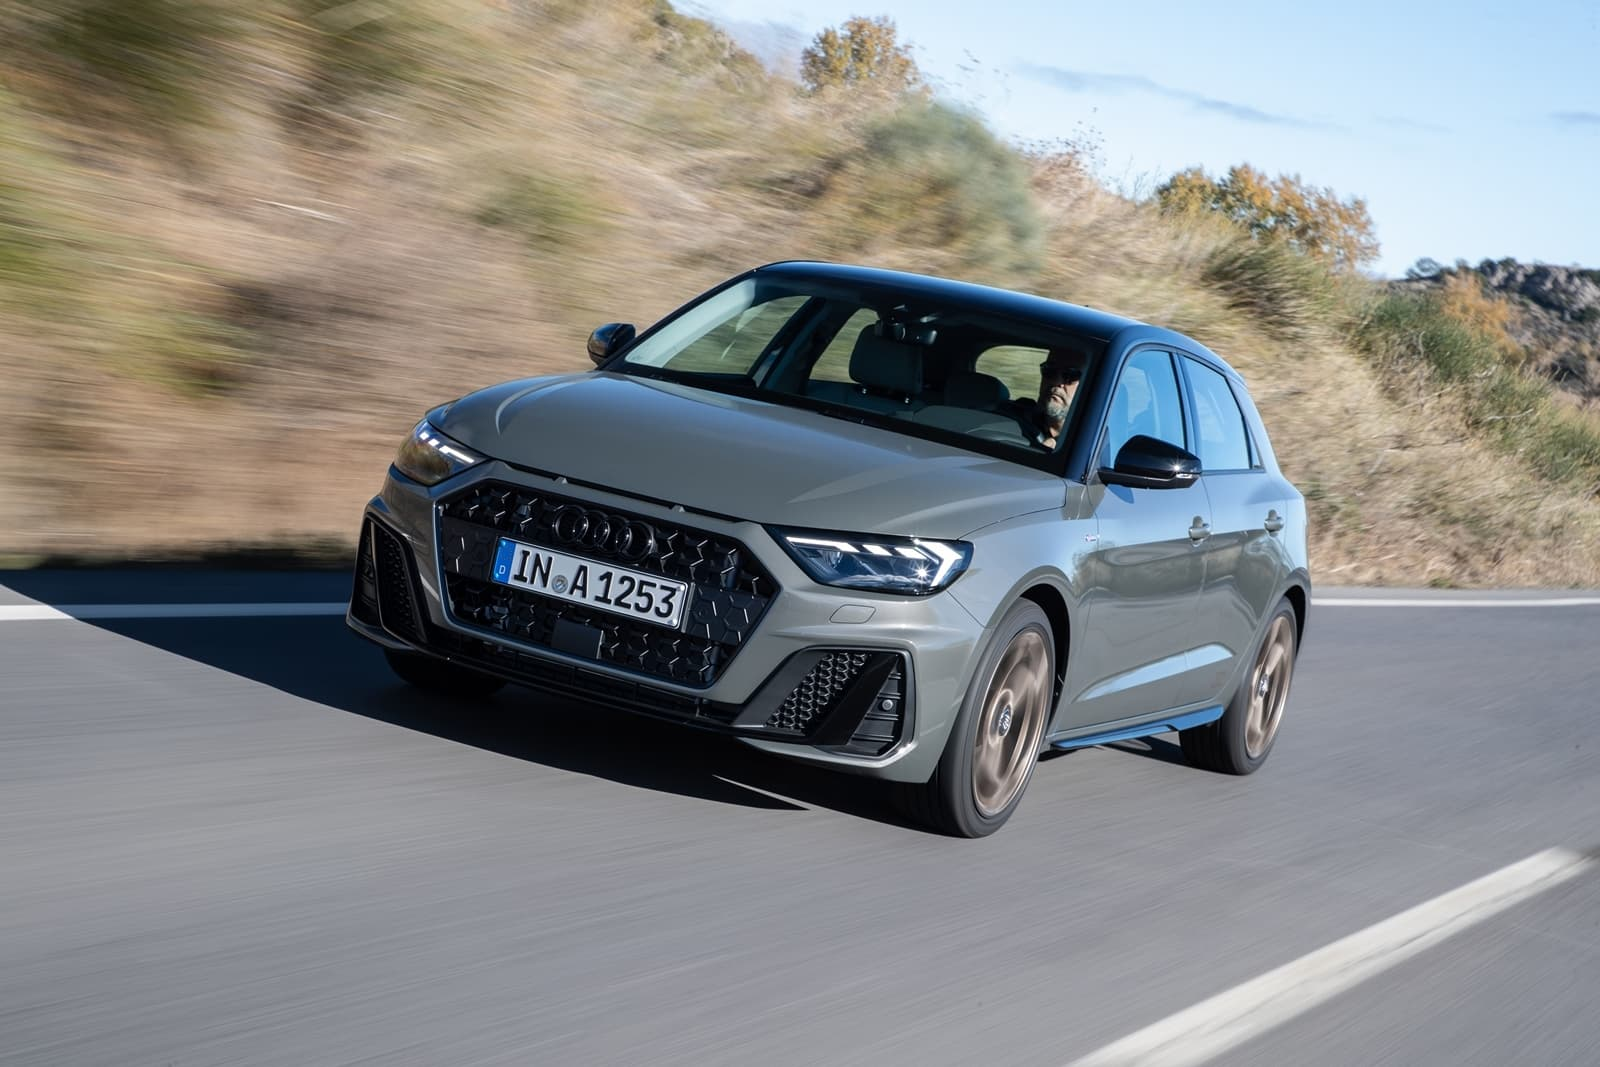 Audi A1 2019 1118 027